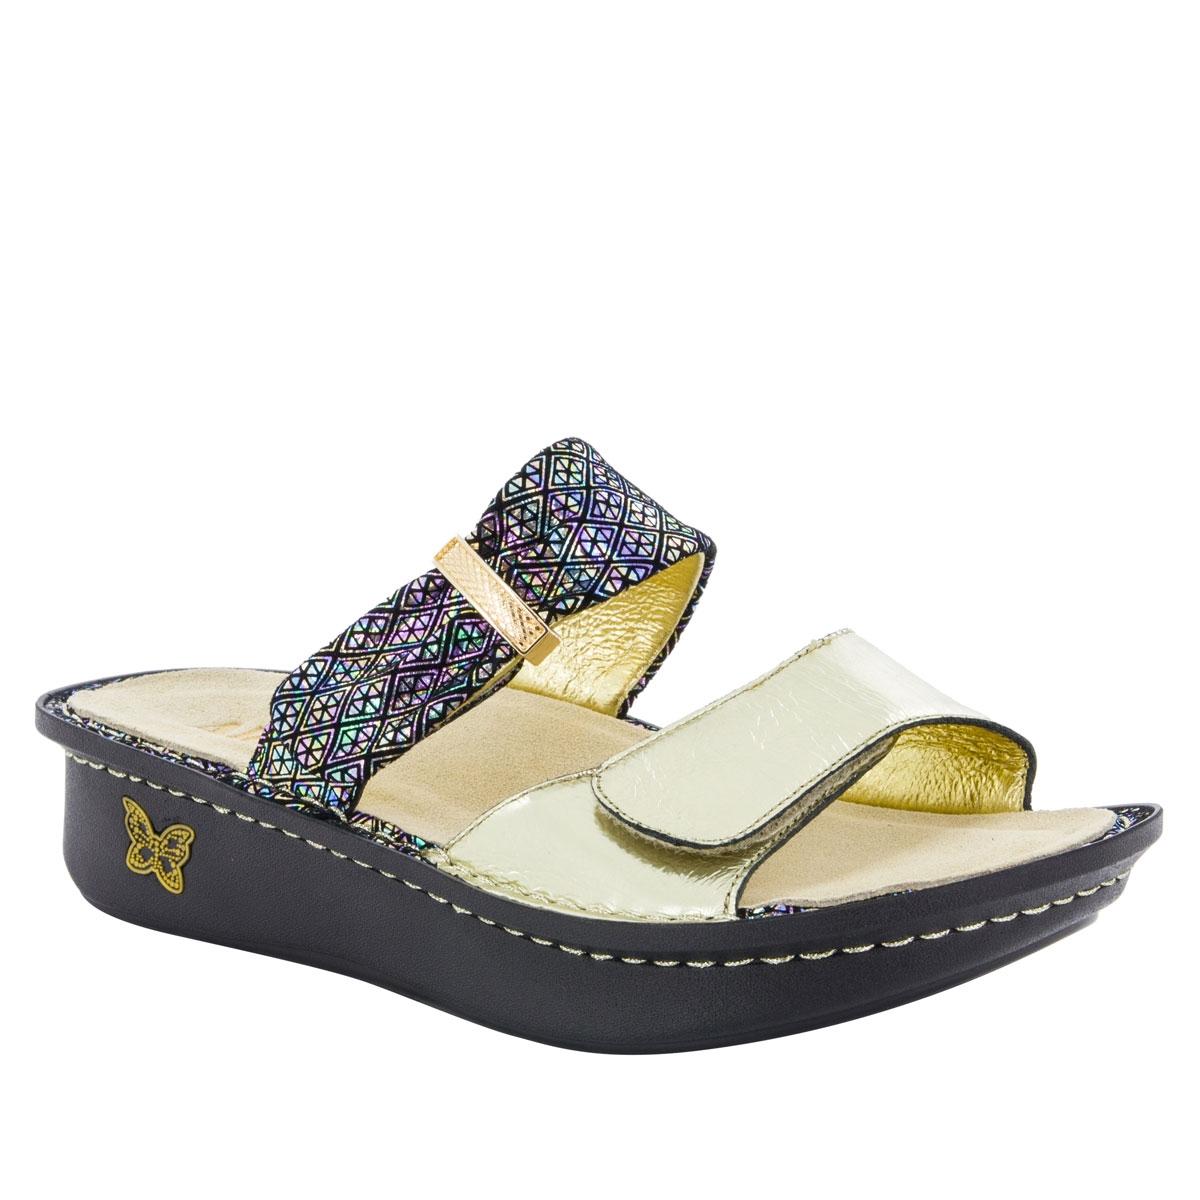 Karmen Diamonds Forever Sandals Alegria Shoes